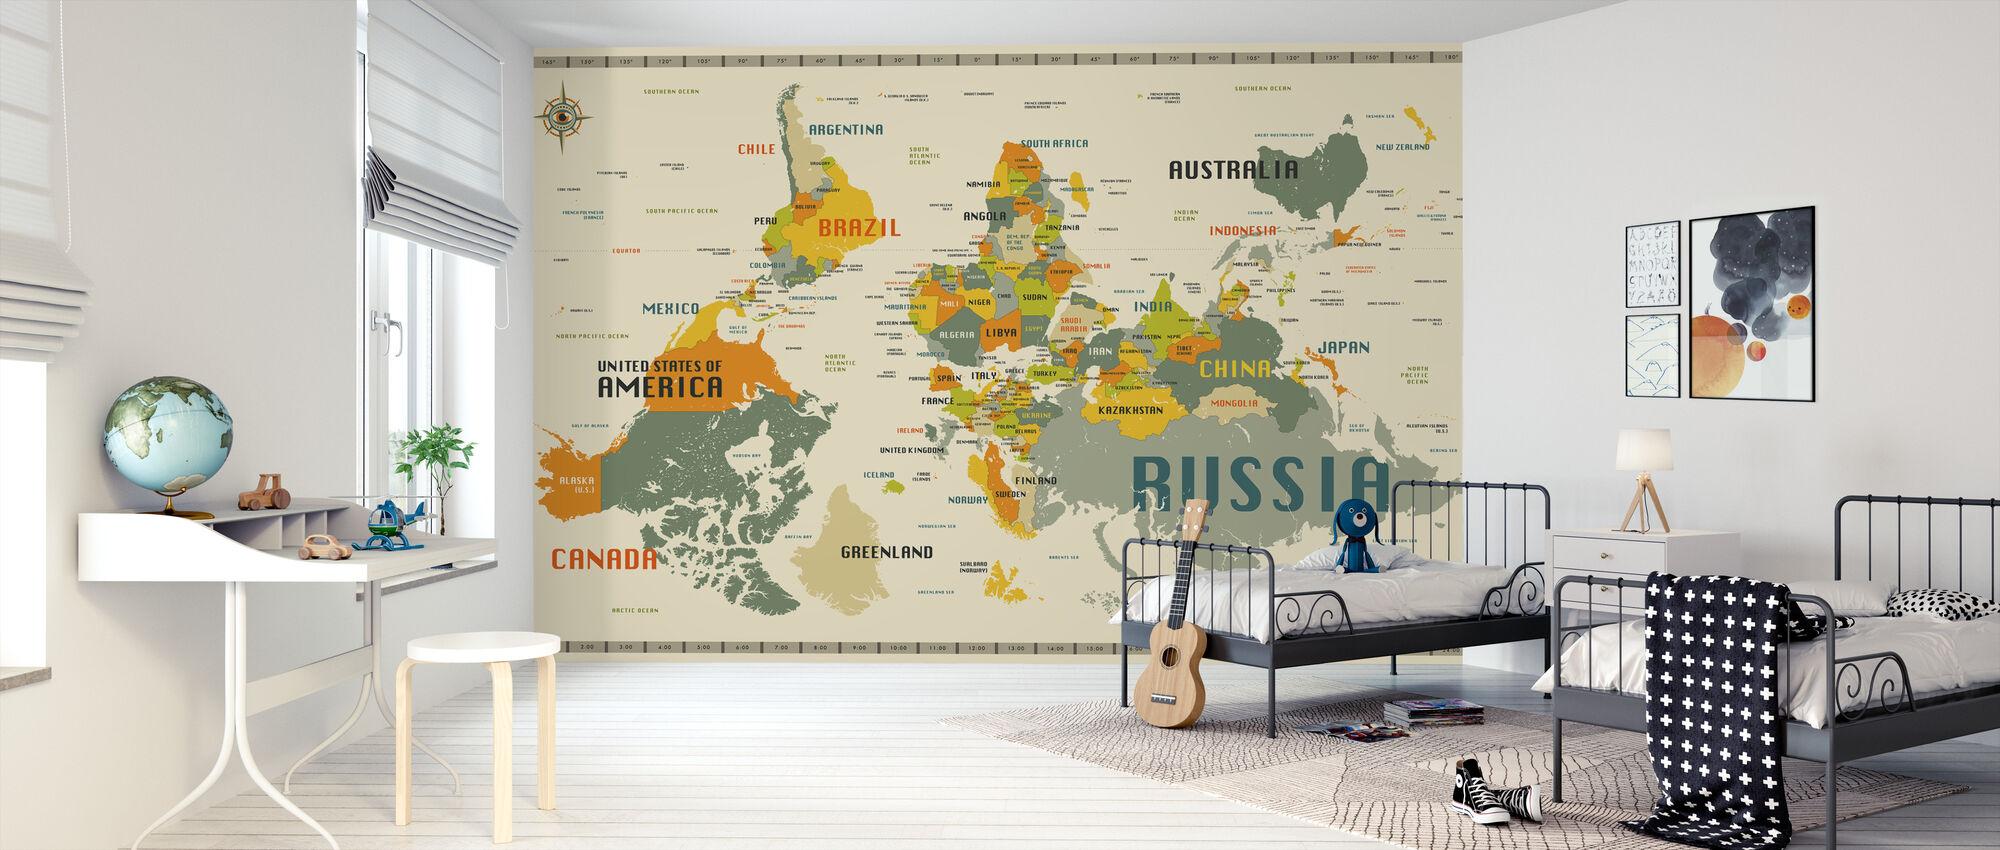 World Map Explore Upside Down - Wallpaper - Kids Room